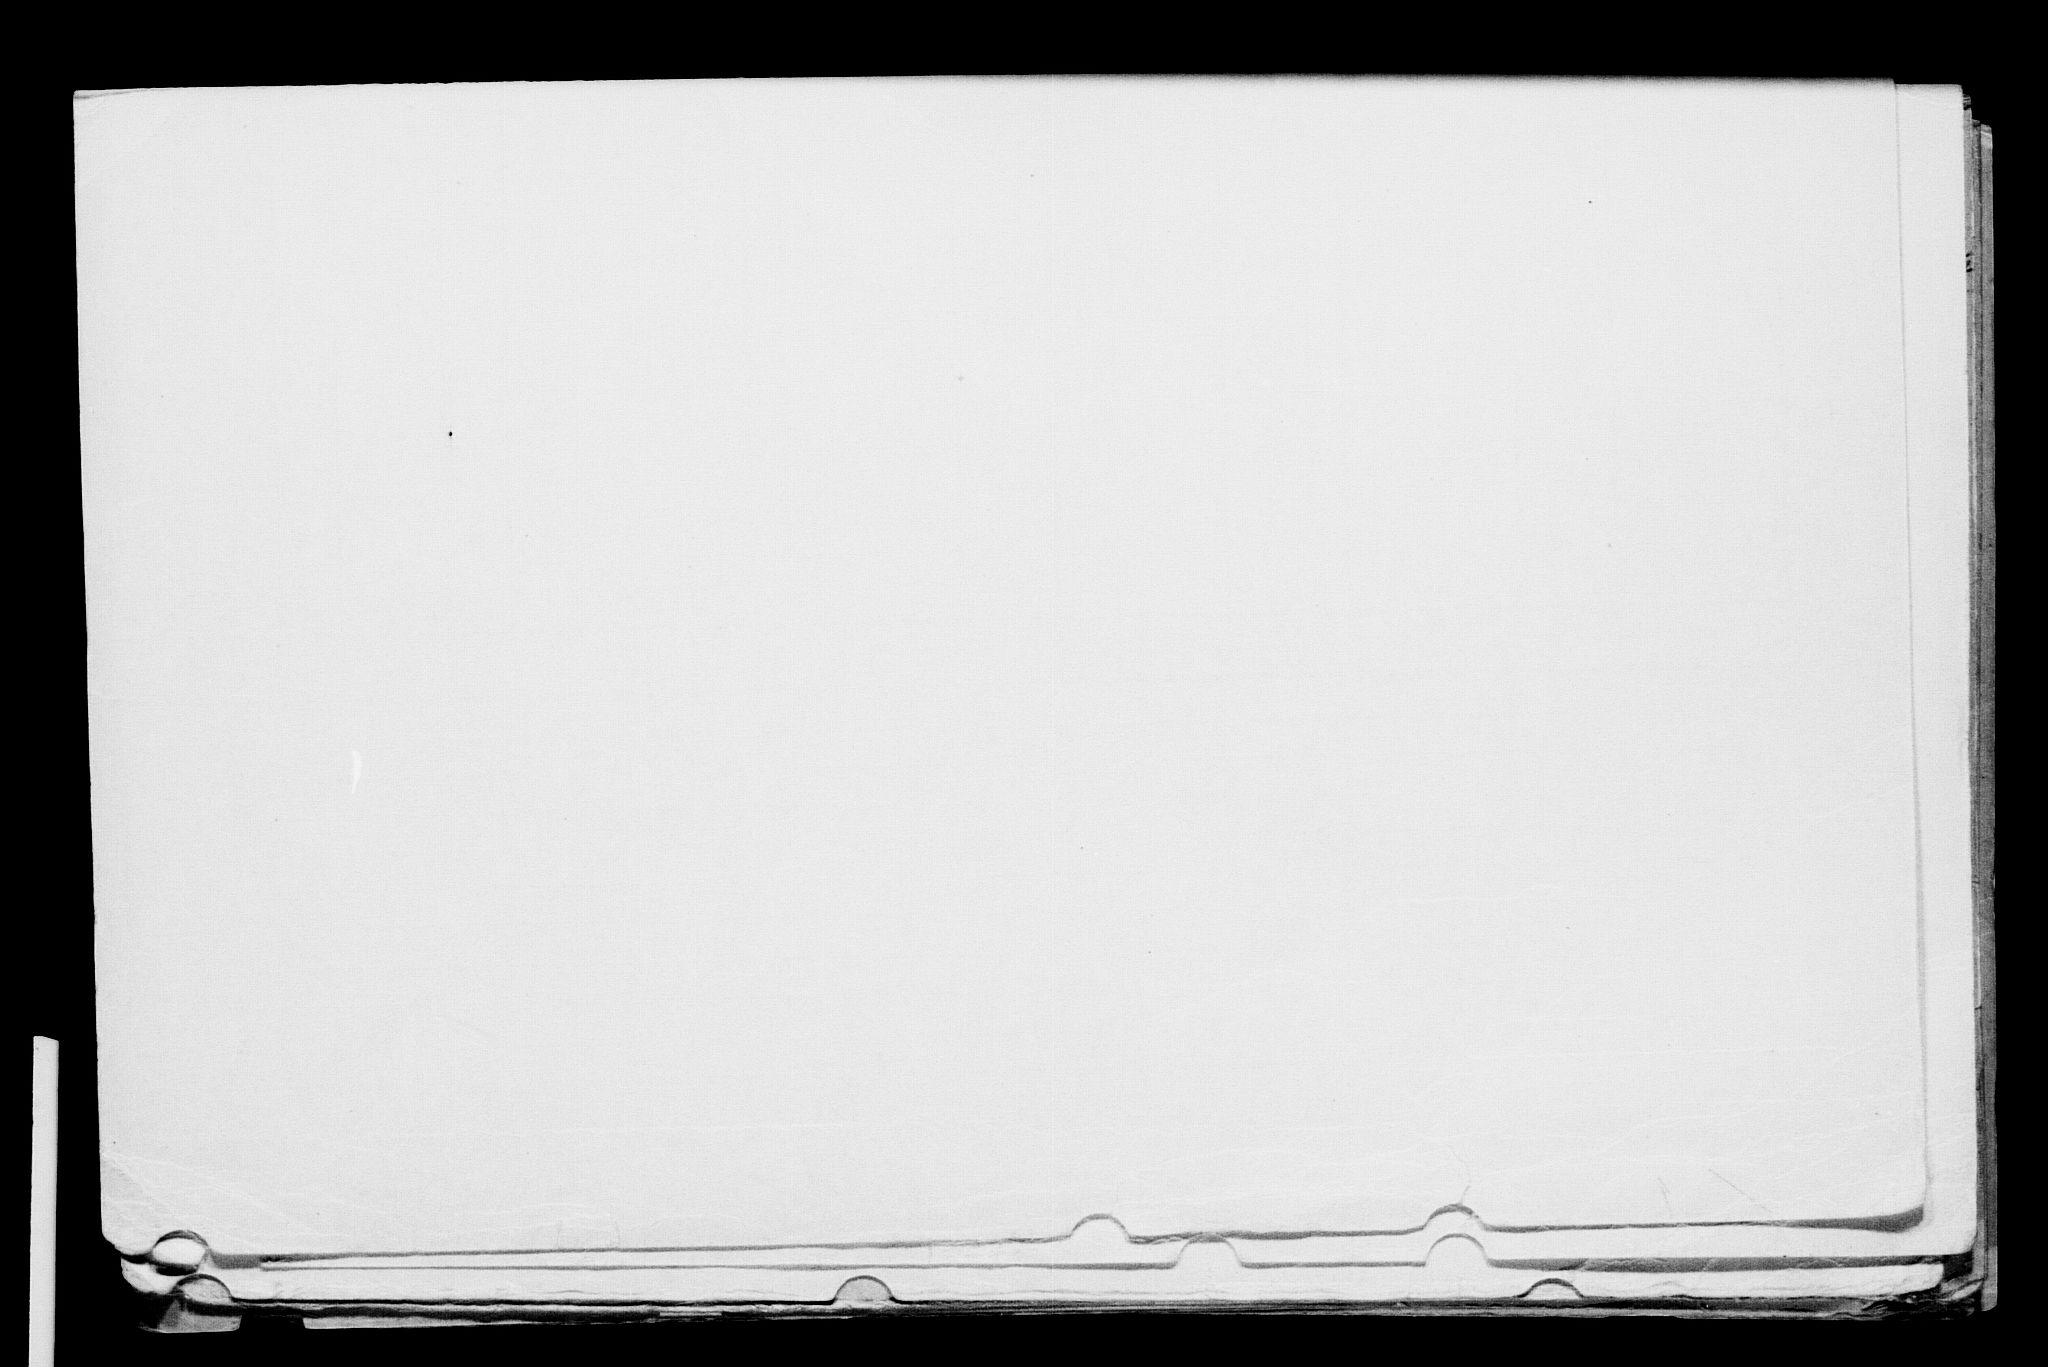 RA, Direktoratet for sjømenn, G/Gb/L0006: Hovedkort, 1889, s. 2